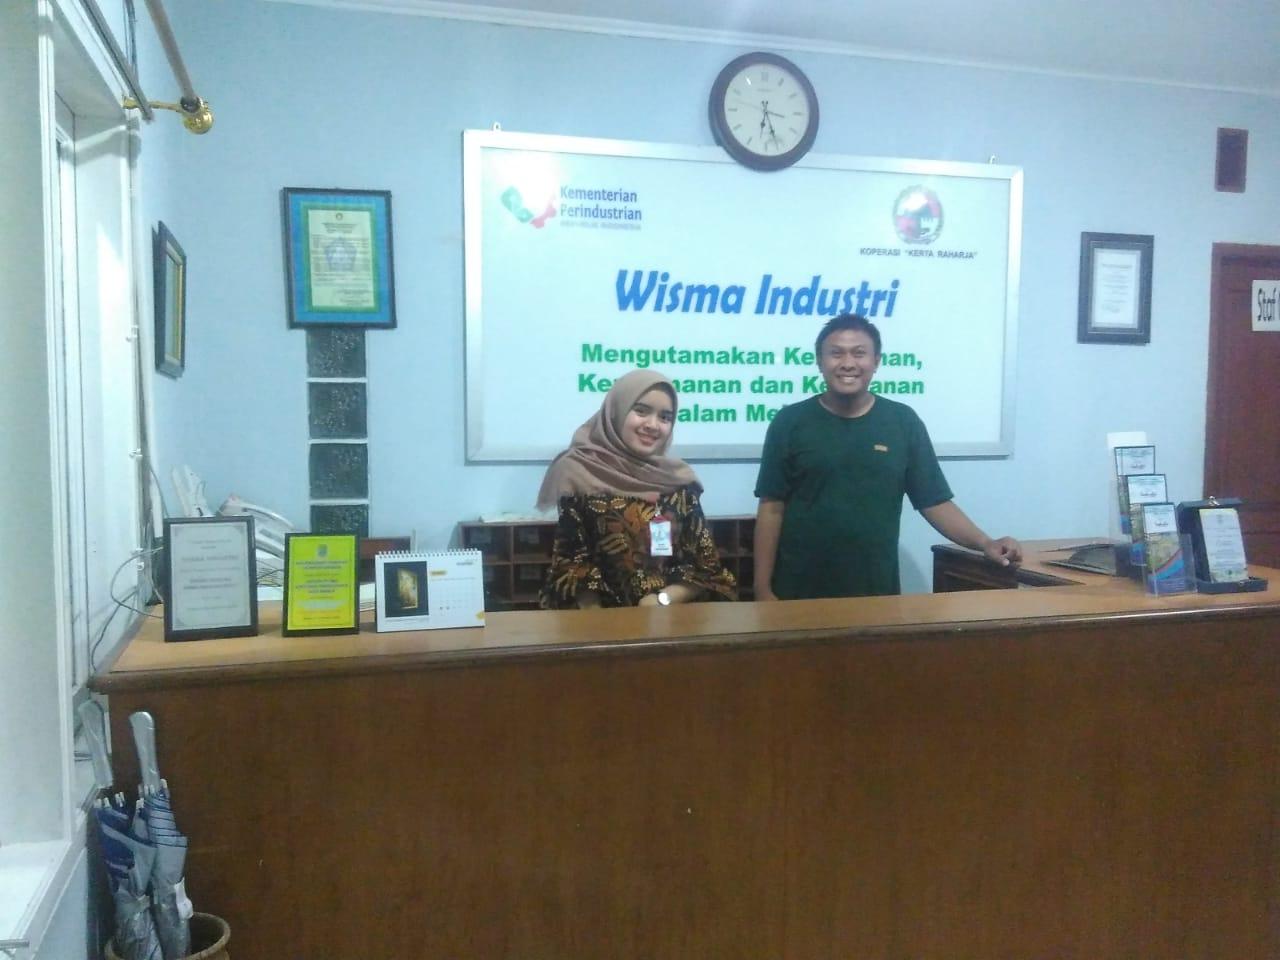 Wisma Industri, Villa Unik di Puncak Bogor